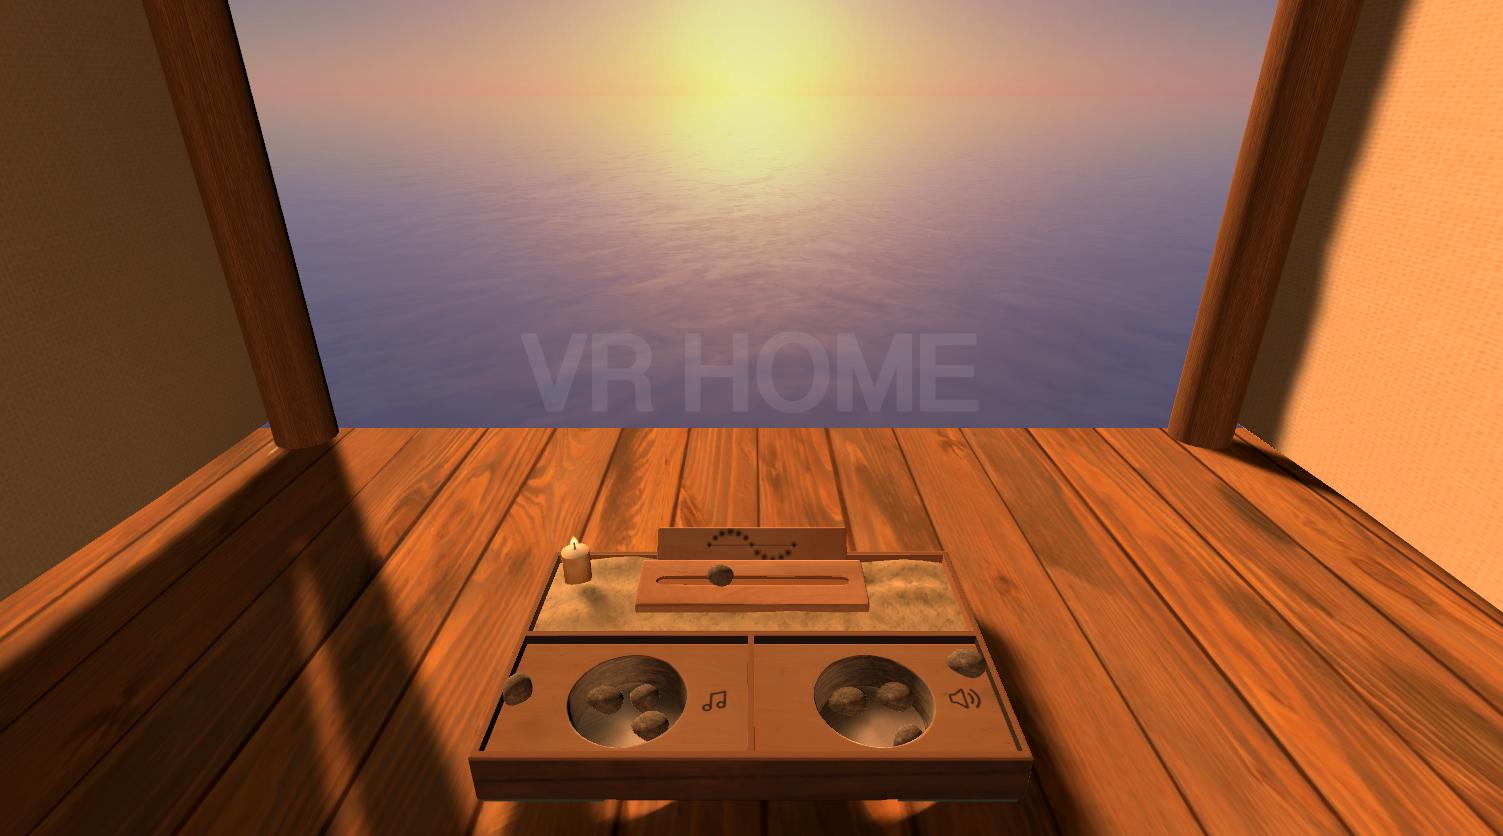 location-based vr, r&d, art direction, ux